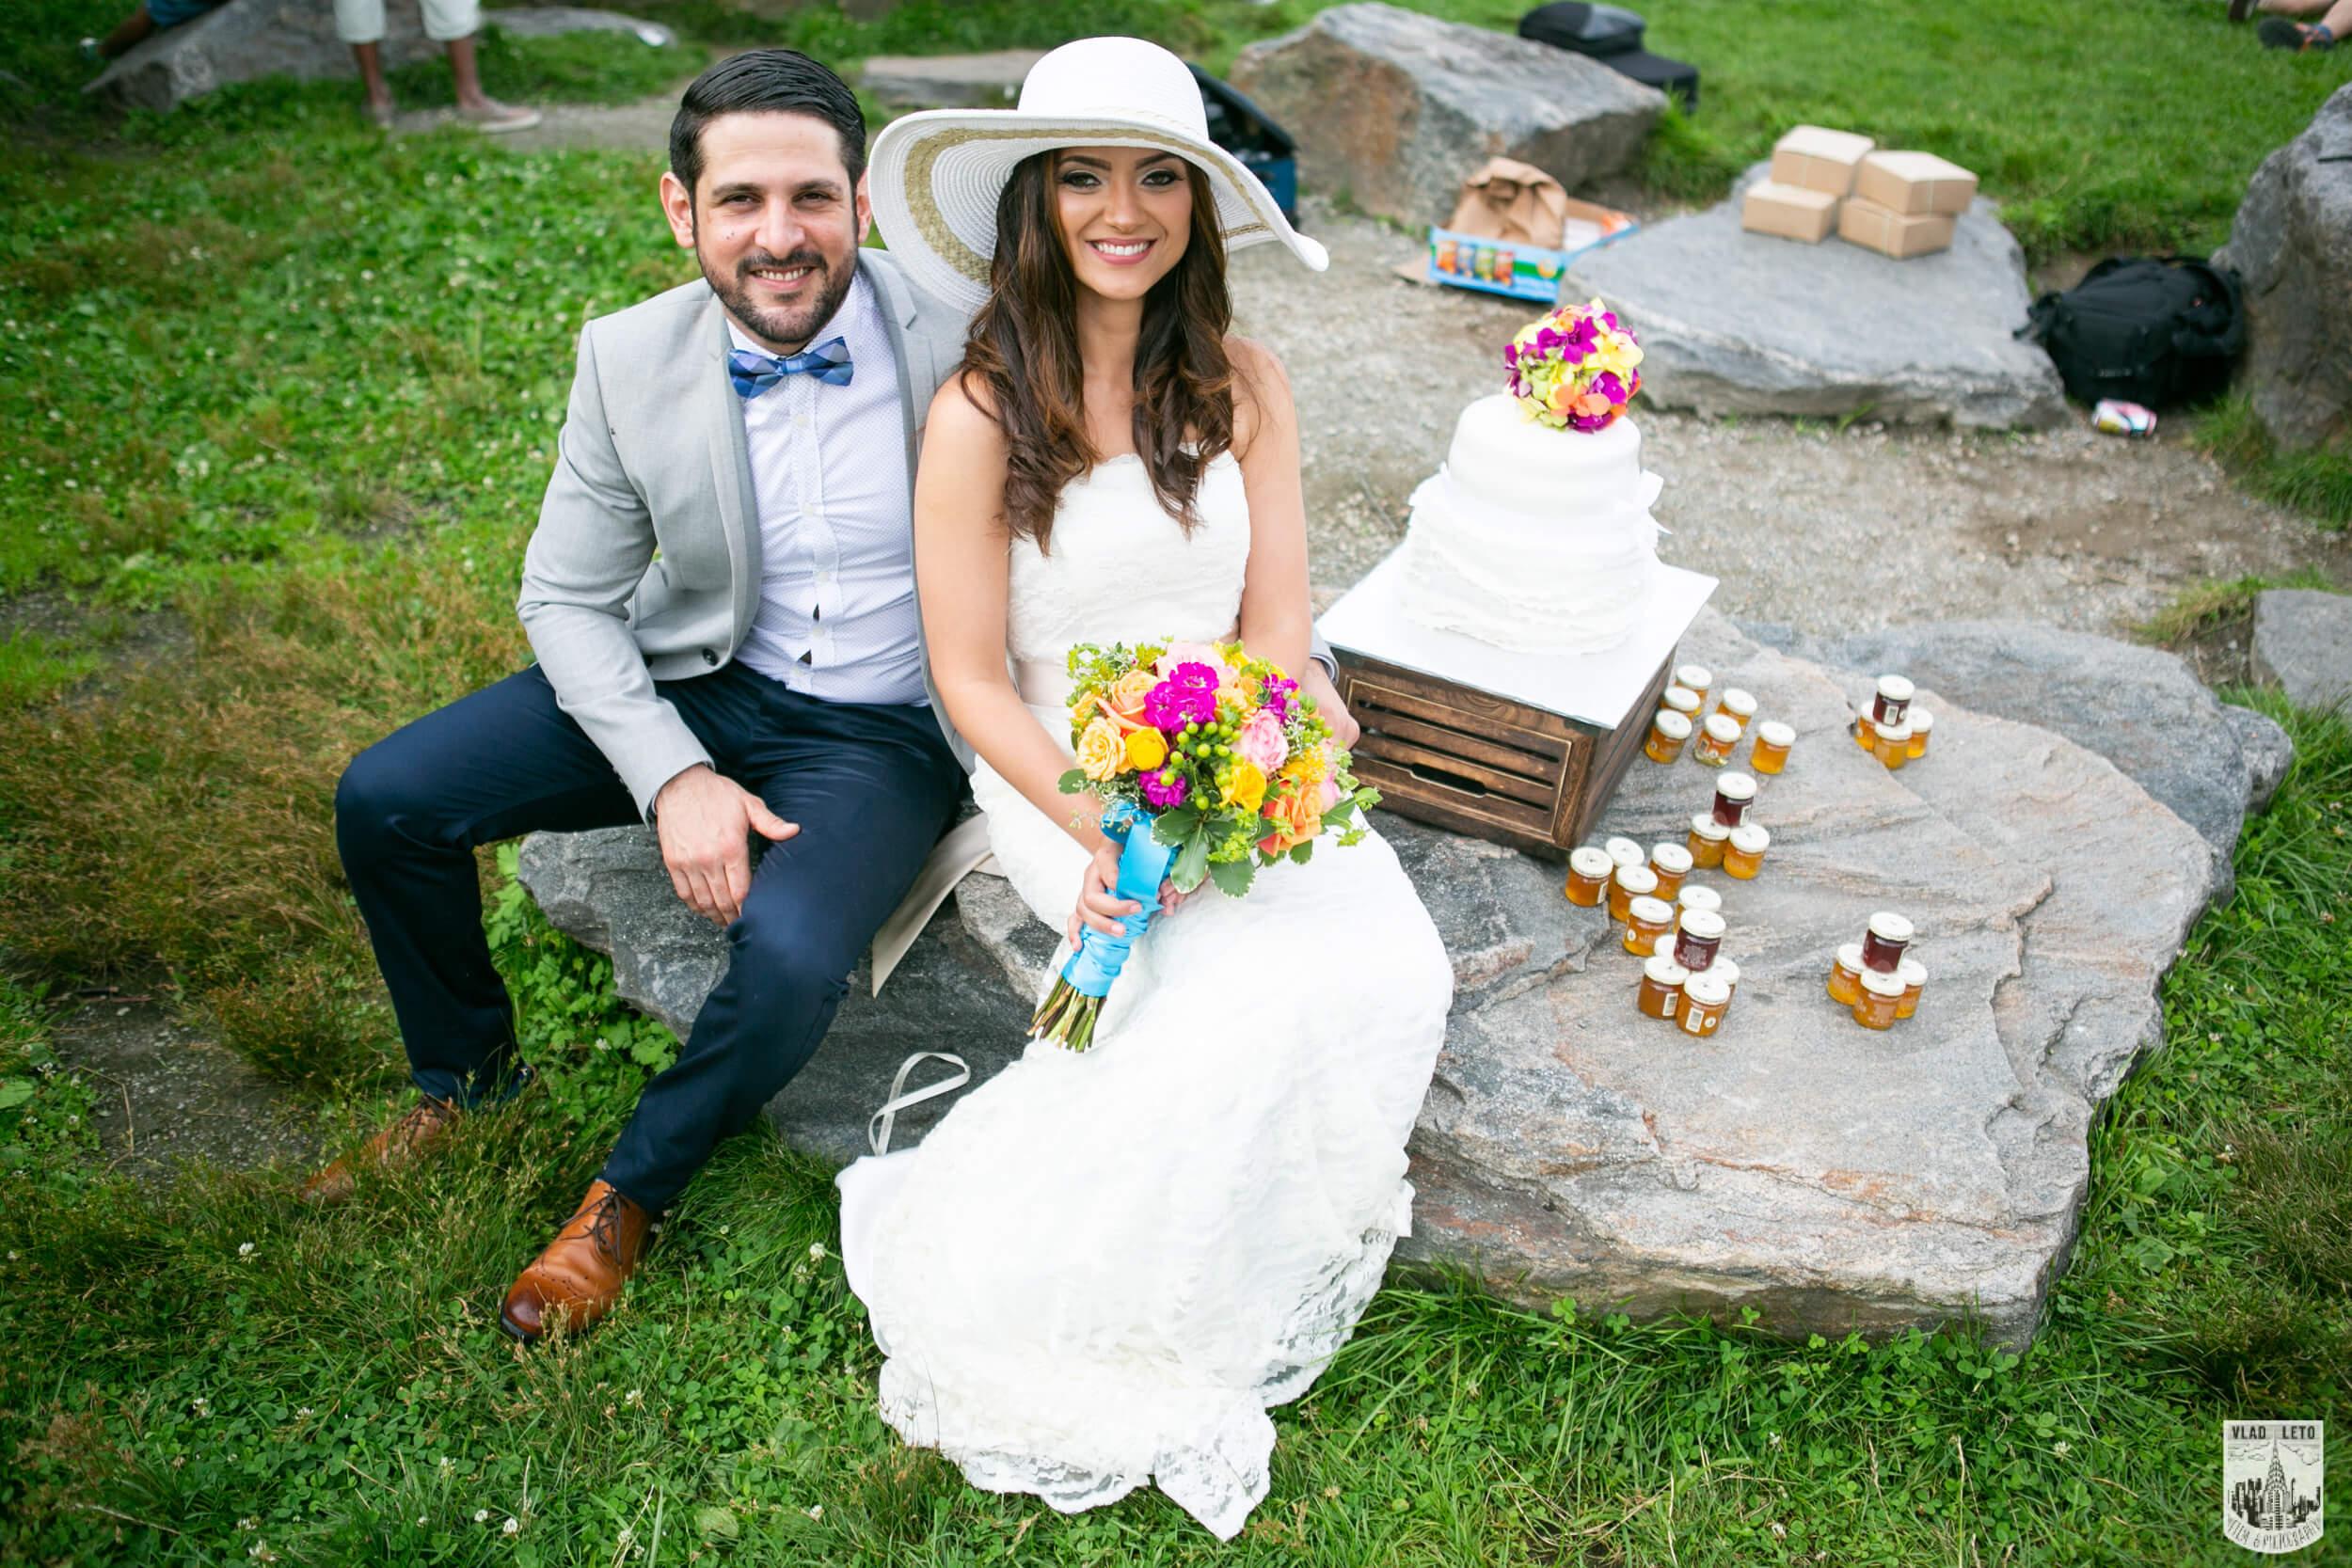 Pop-up wedding in New York